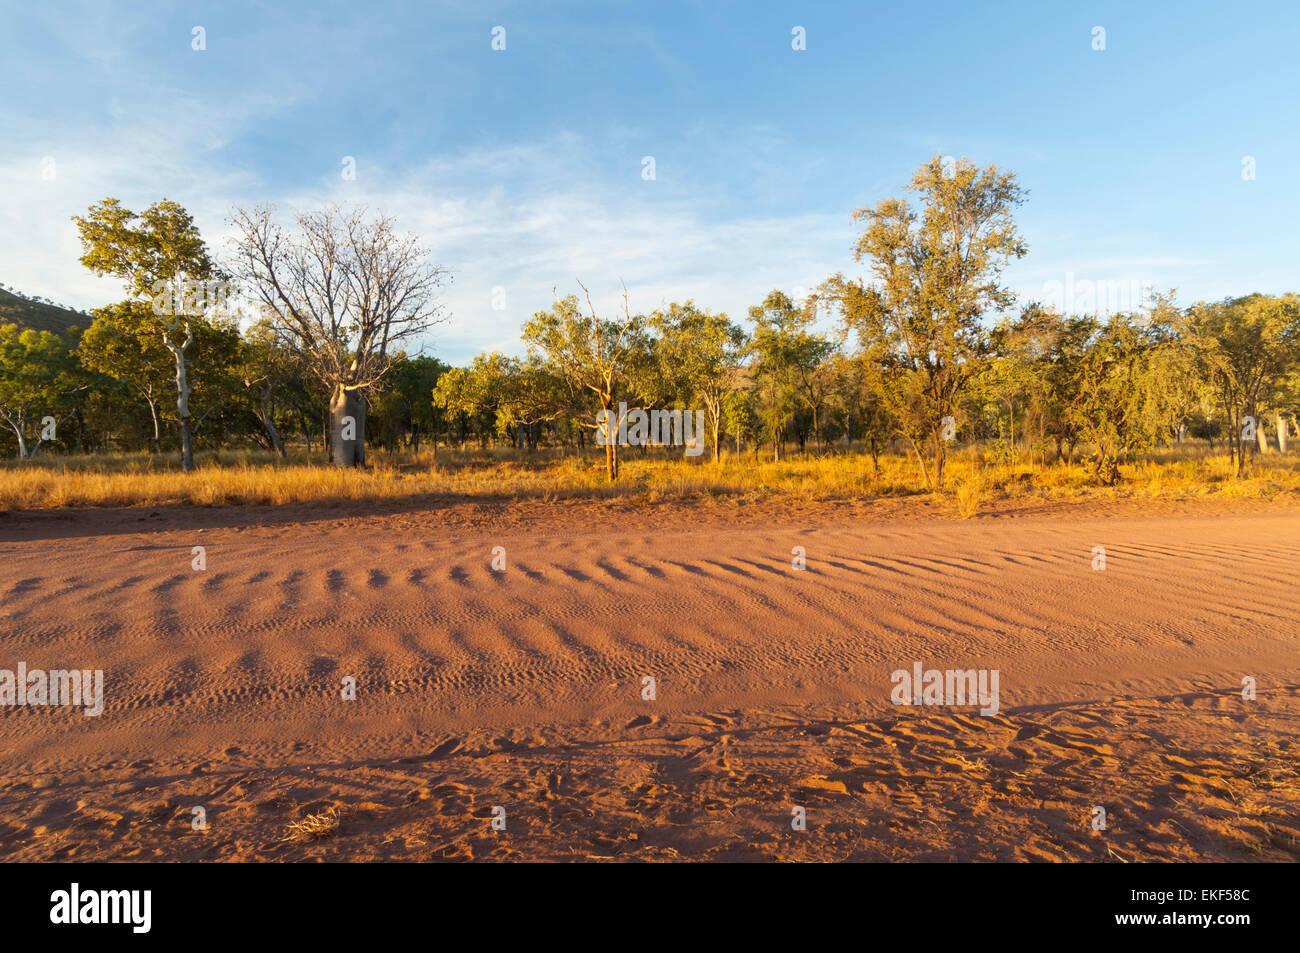 Corrugation on the Gibb River Road, Kimberley, Outback, Western Australia, WA, Australia Stock Photo